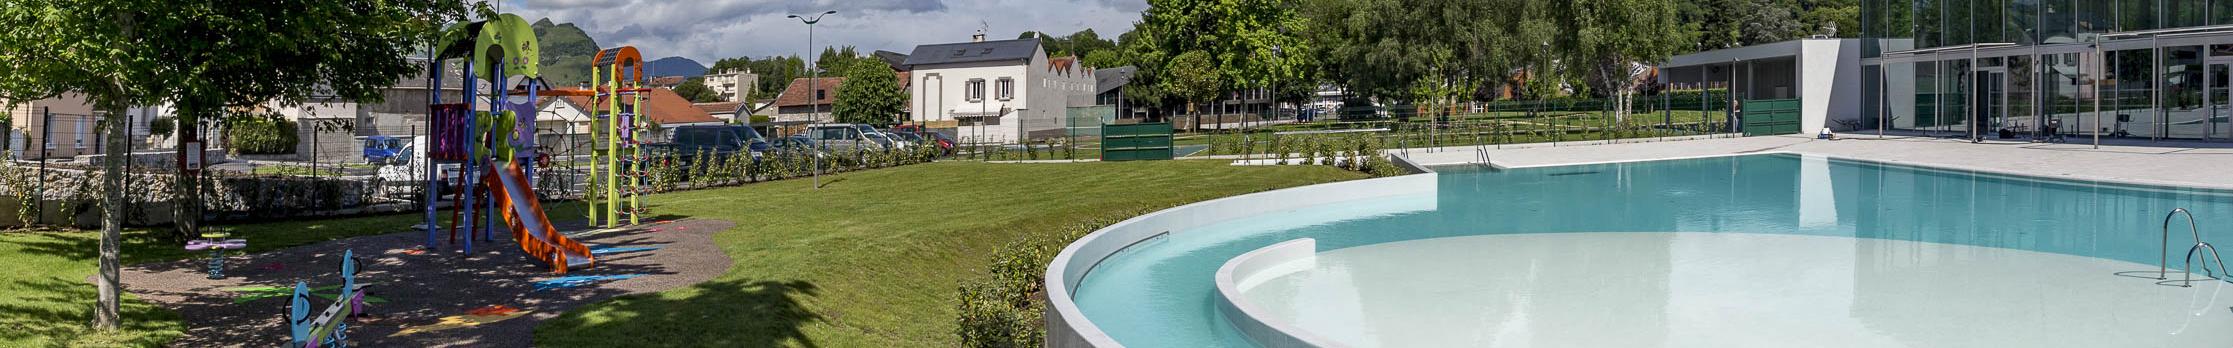 Panorama-jeux-piscine